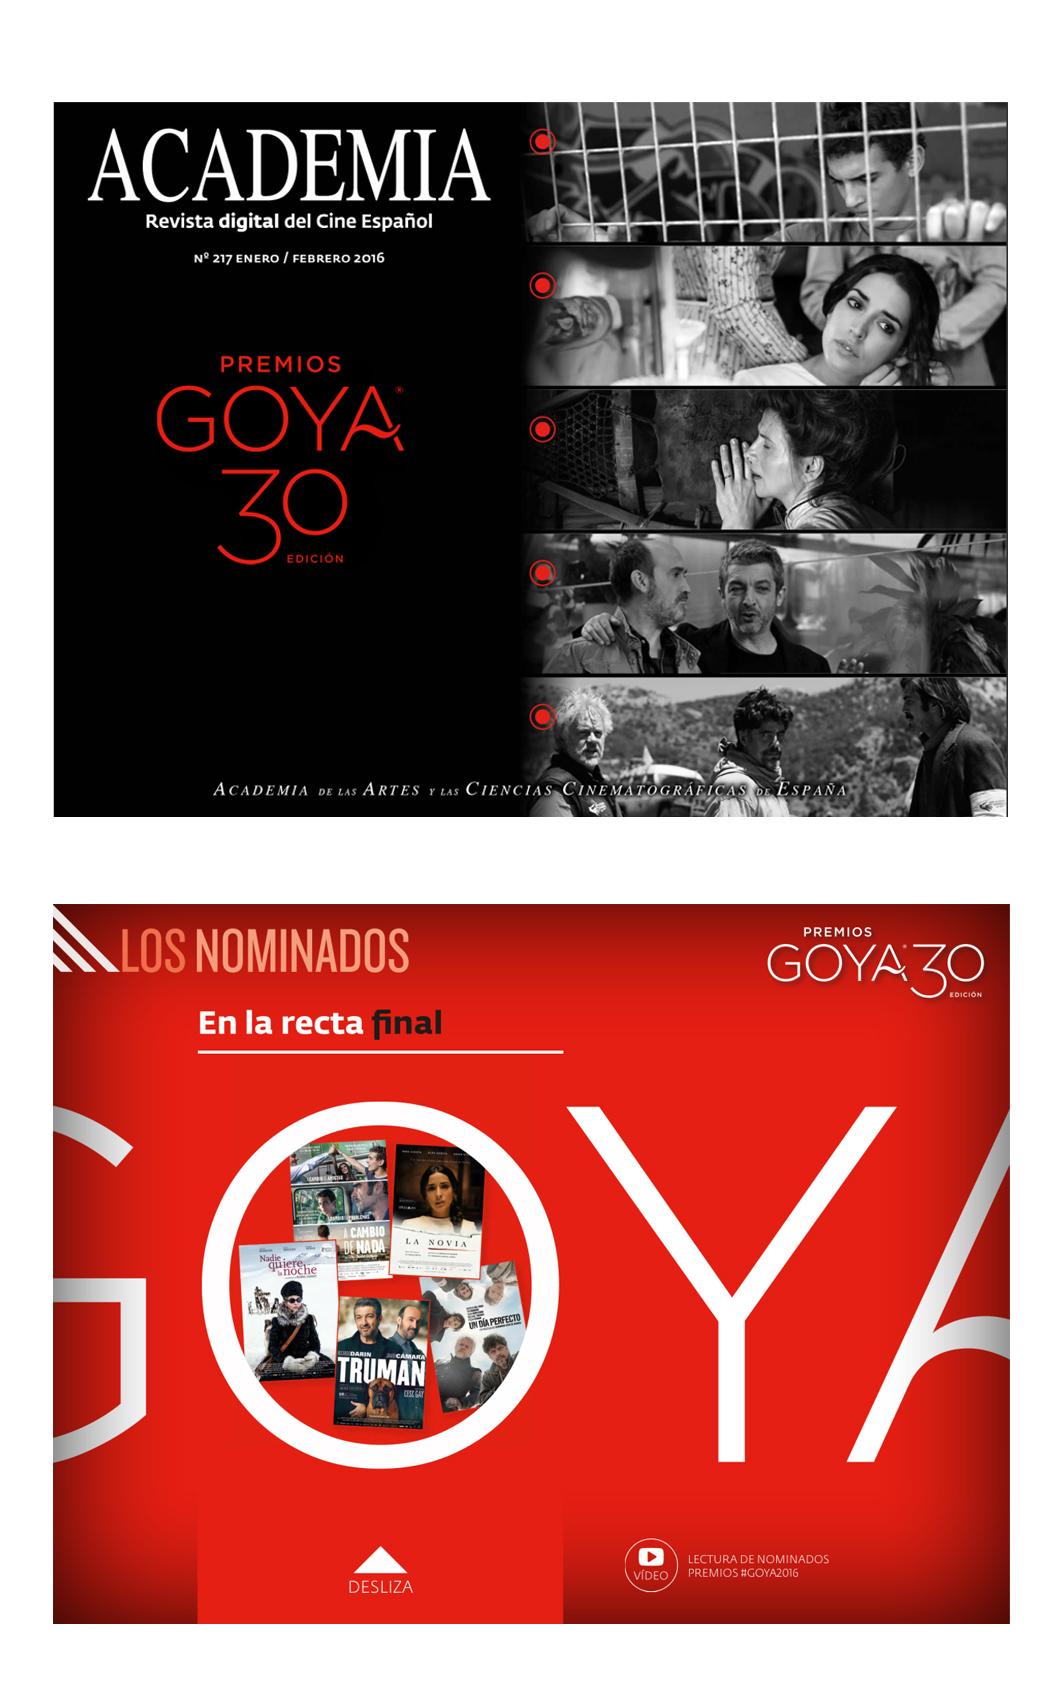 3-events Nominados Goya 2016